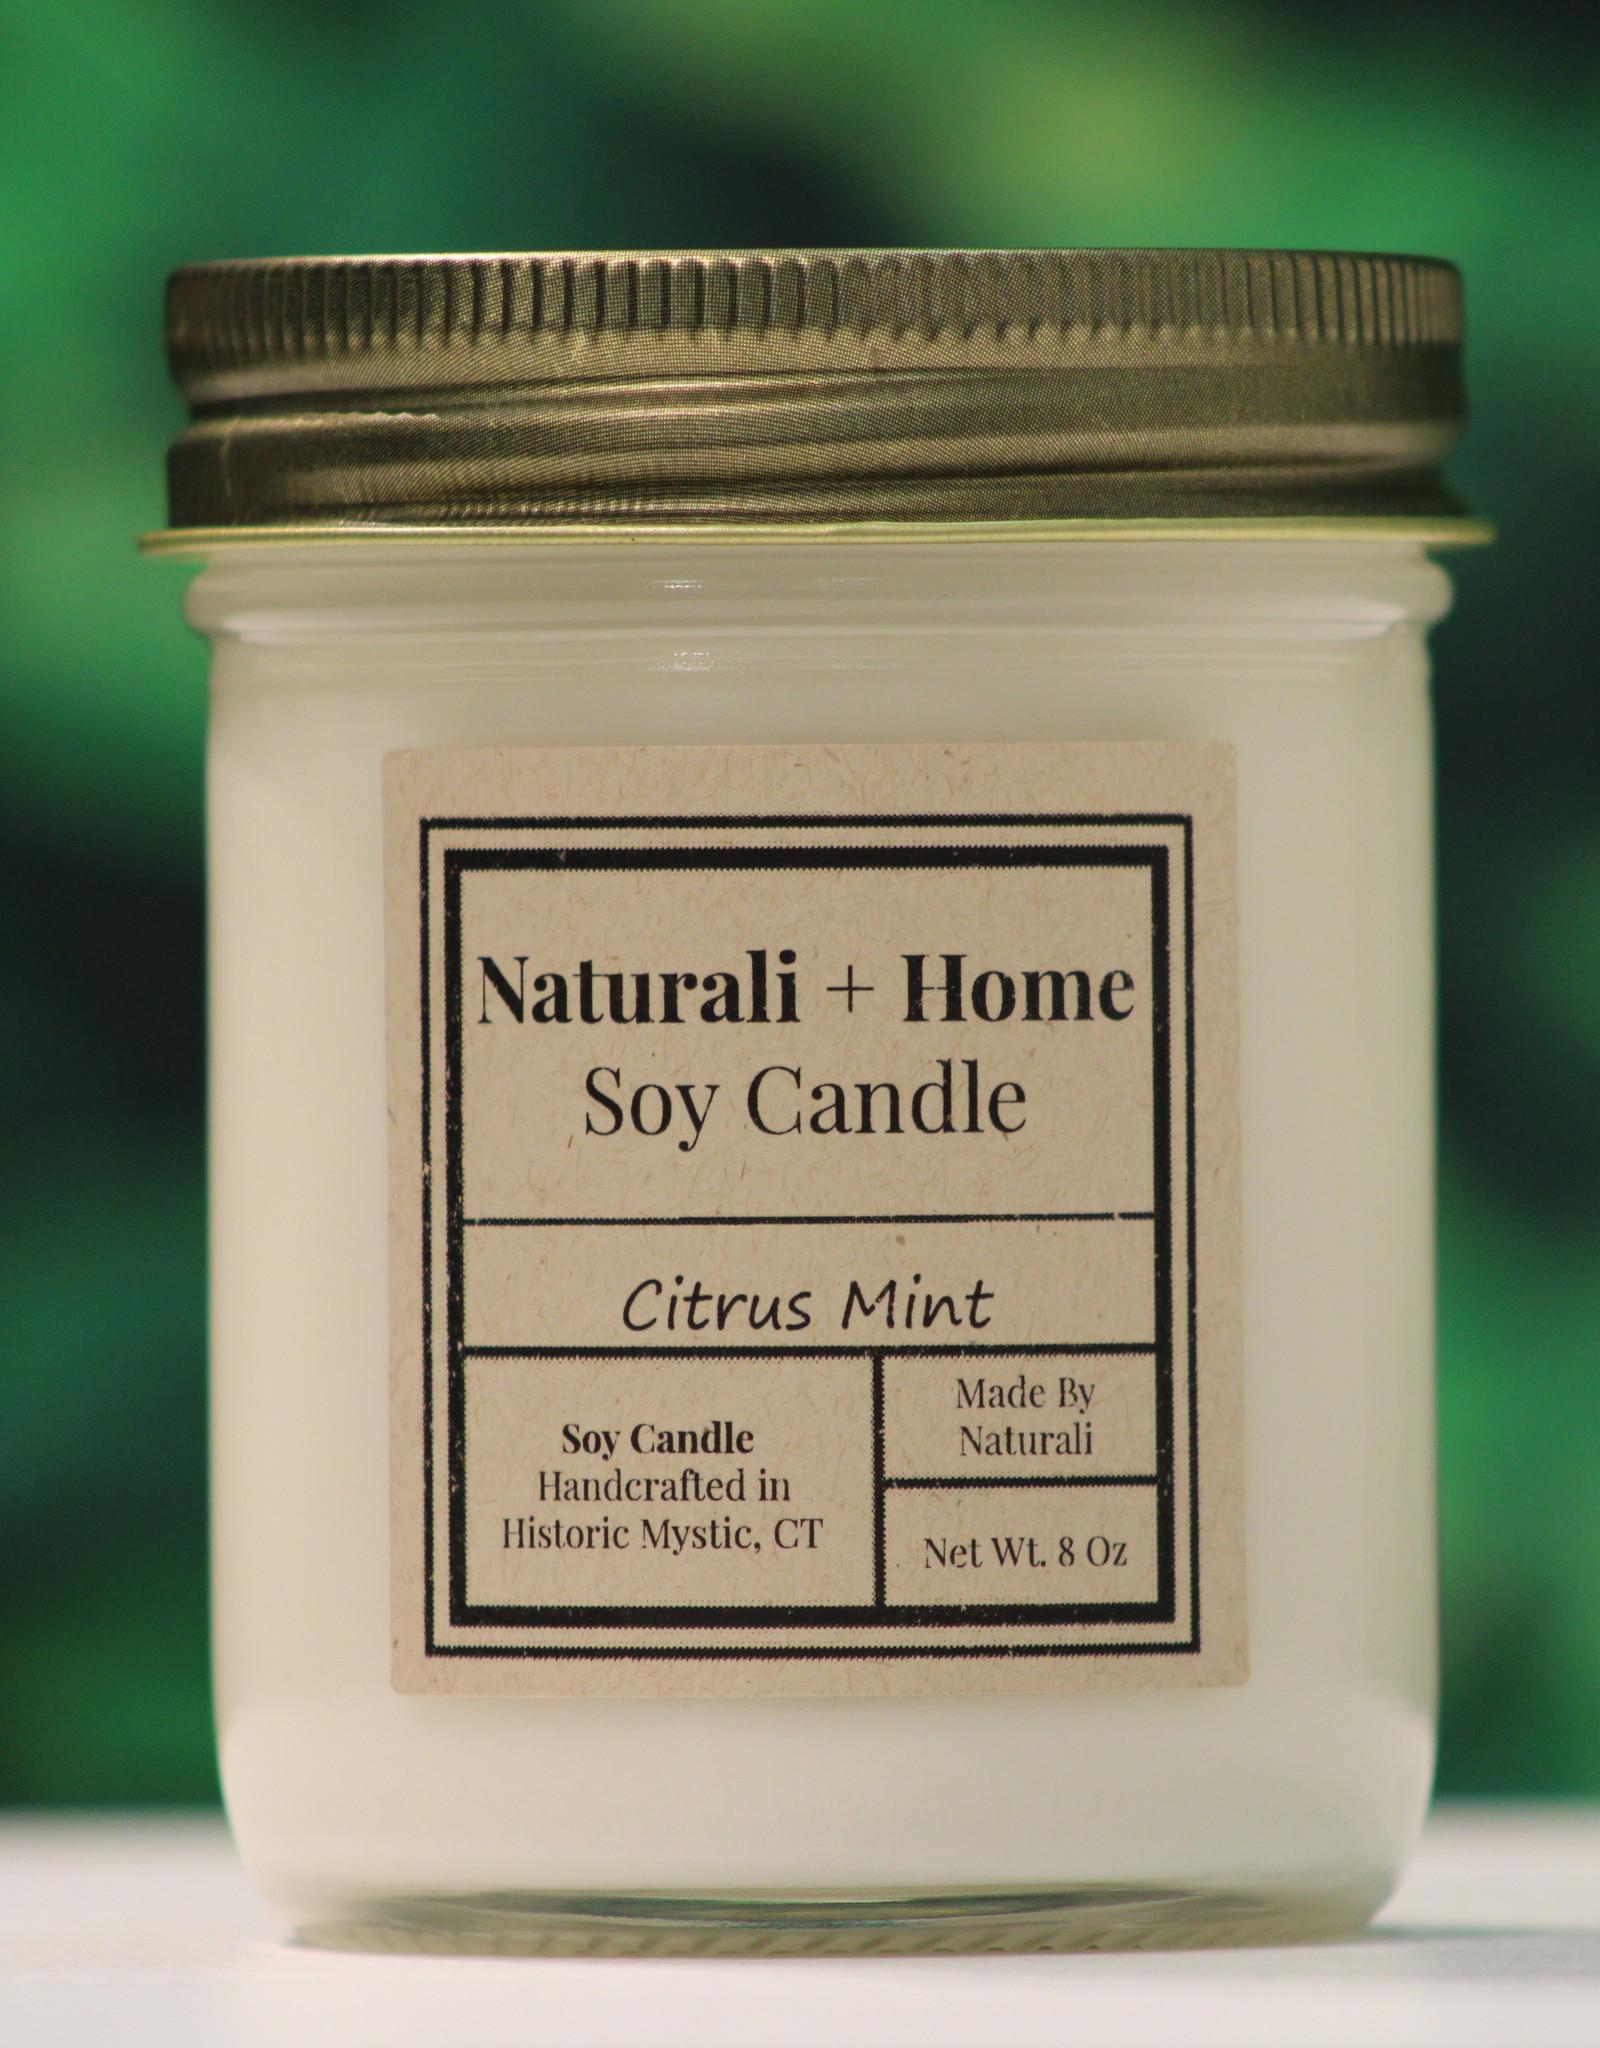 Naturali Home Citrus Mint Soy Candle (8oz)